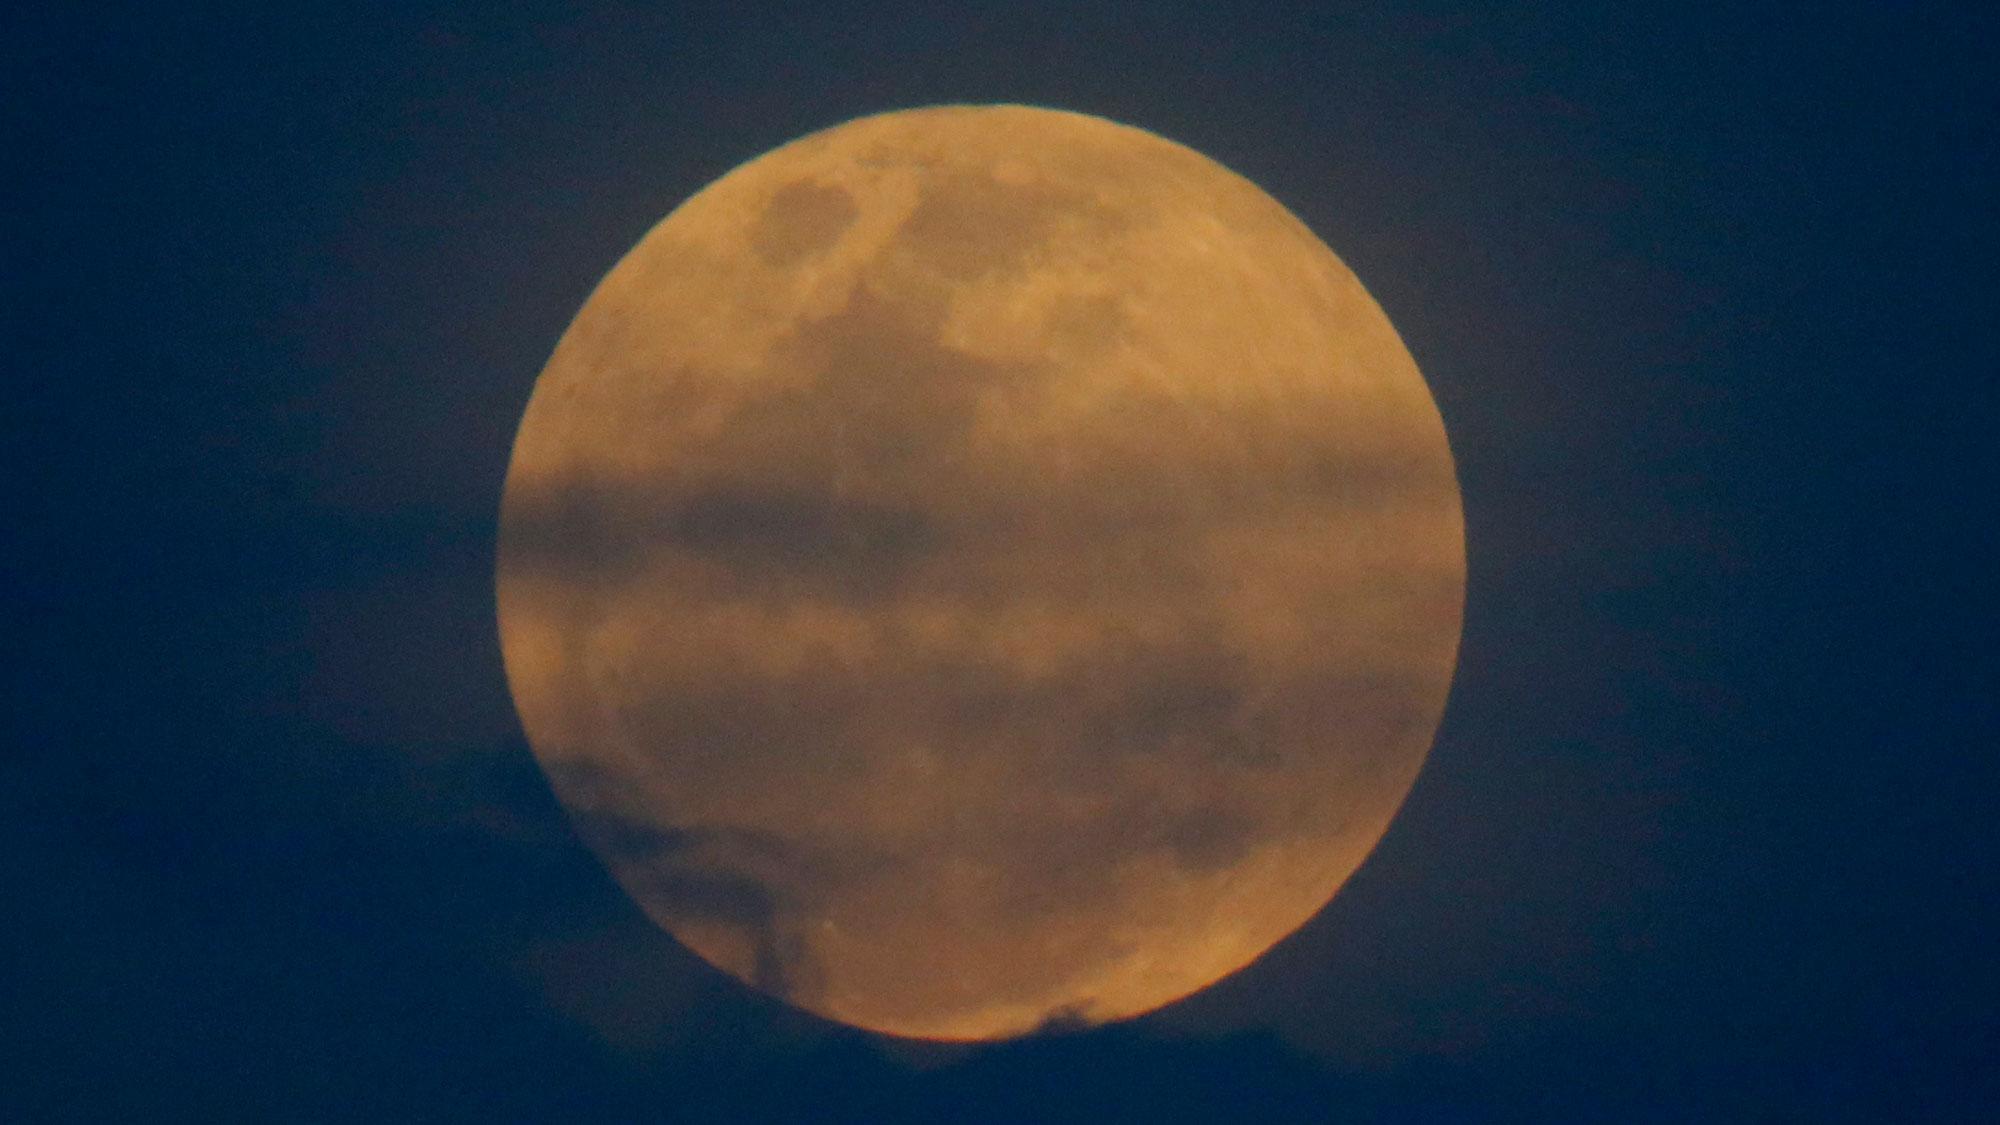 red moon phenomenon 2018 - photo #22